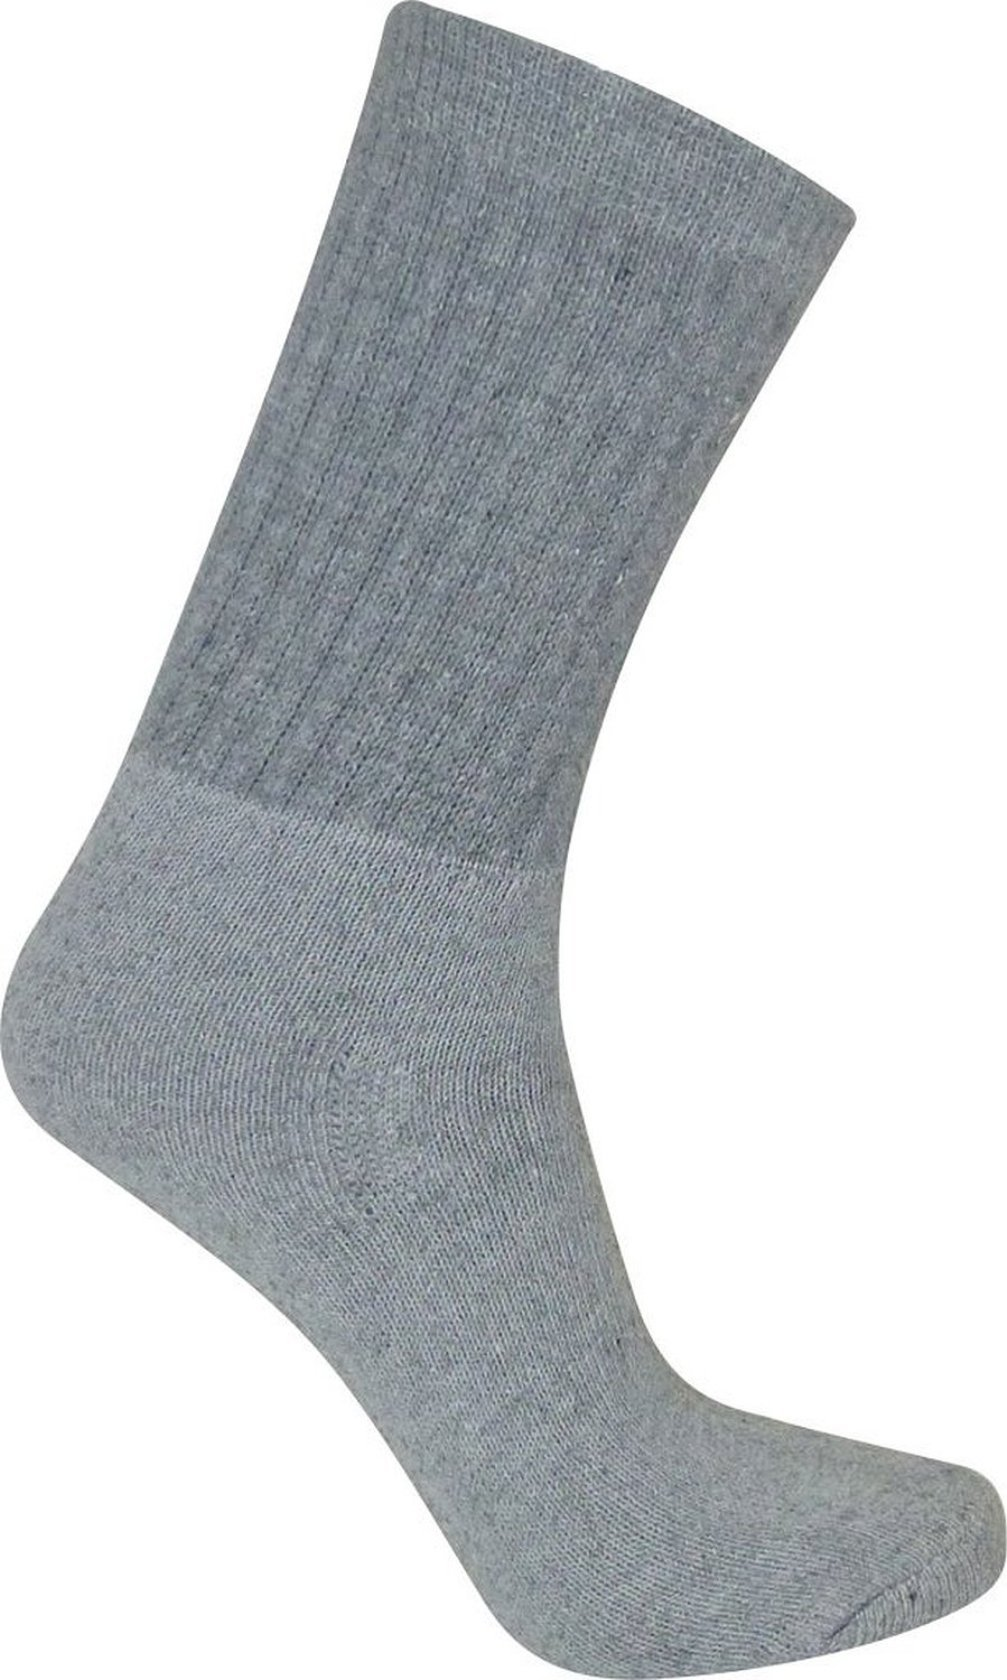 Davido Mens Socks crew made in italy 100% cotton 8 pairs (10-13, gray crew socks)